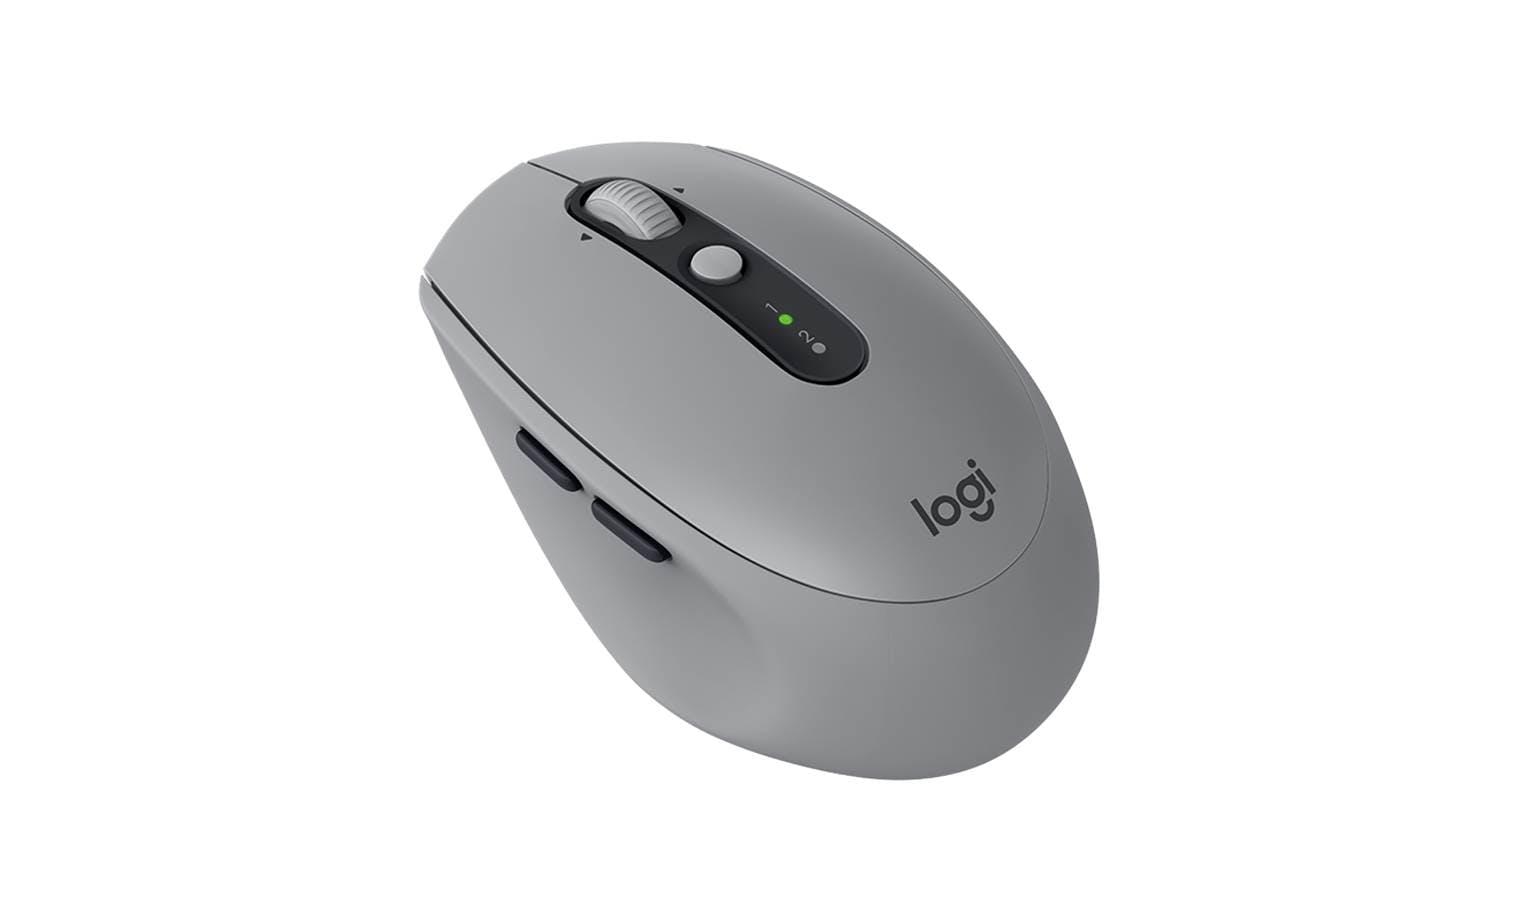 cad868668d6 Logitech M590 (910-005204) Multi-Device Silent Wireless Mouse - Mid Grey  Tonal | Harvey Norman Singapore